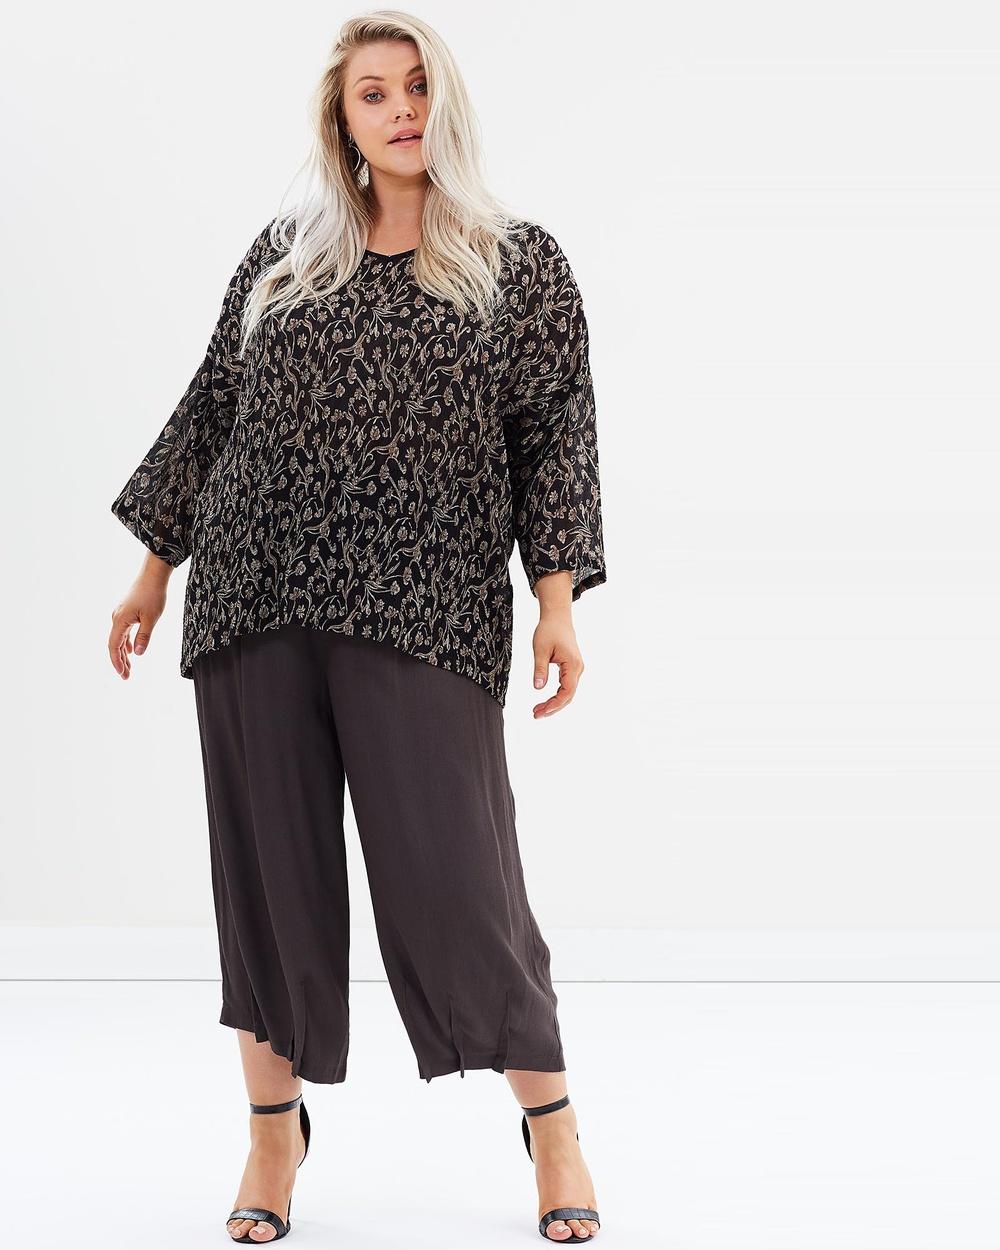 Advocado Plus Spectrum Pull On Culottes Pants Slate